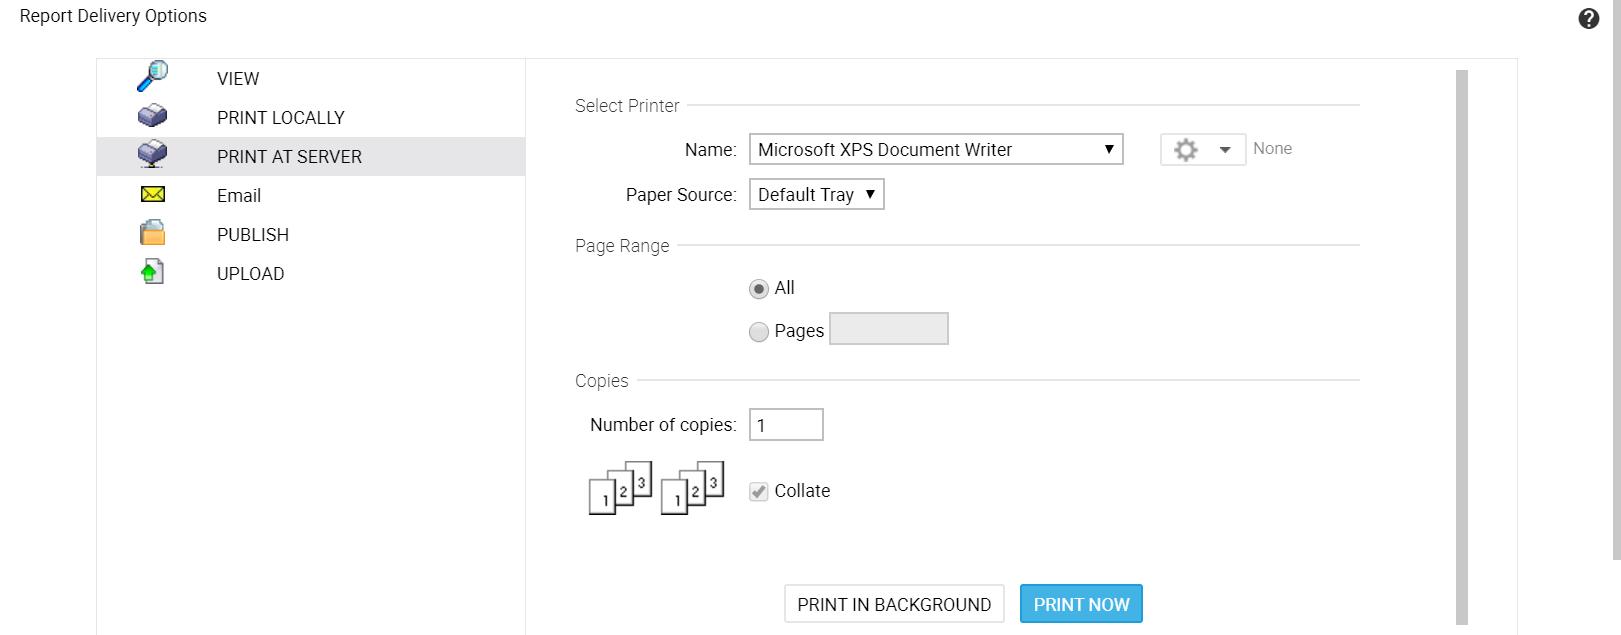 Printing at Server